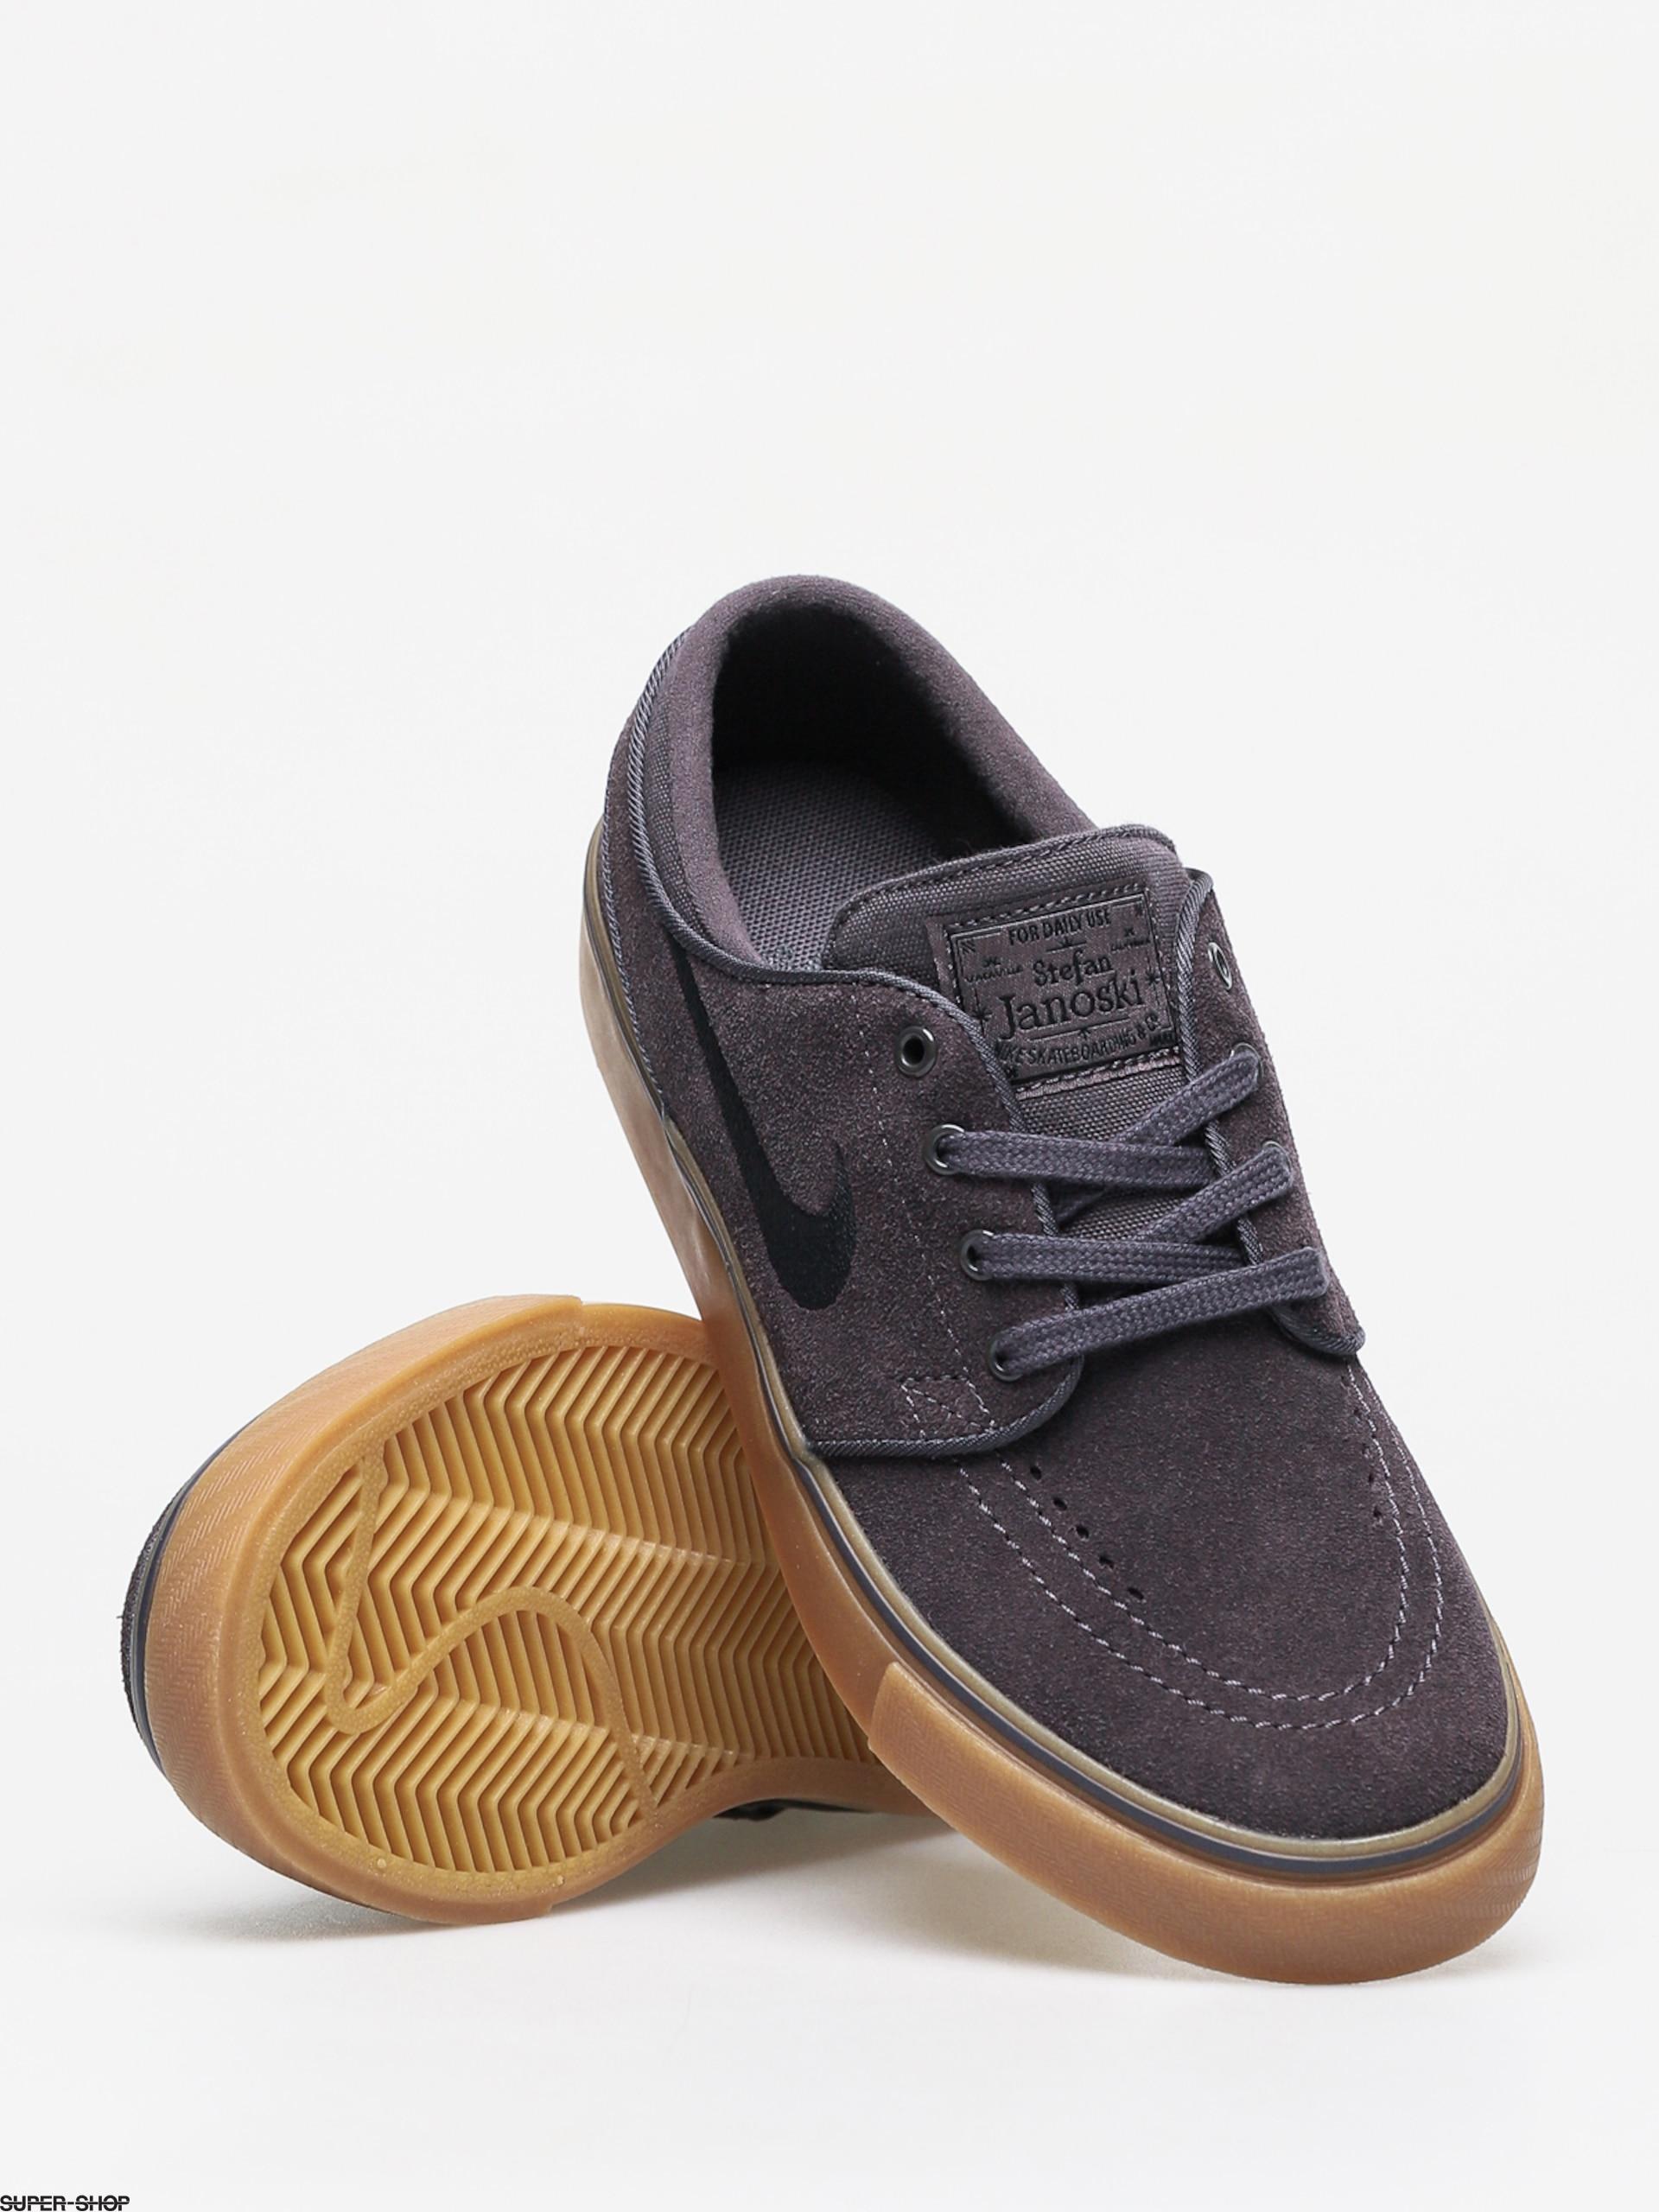 Nike SB Stefan Janoski Leather Shoes